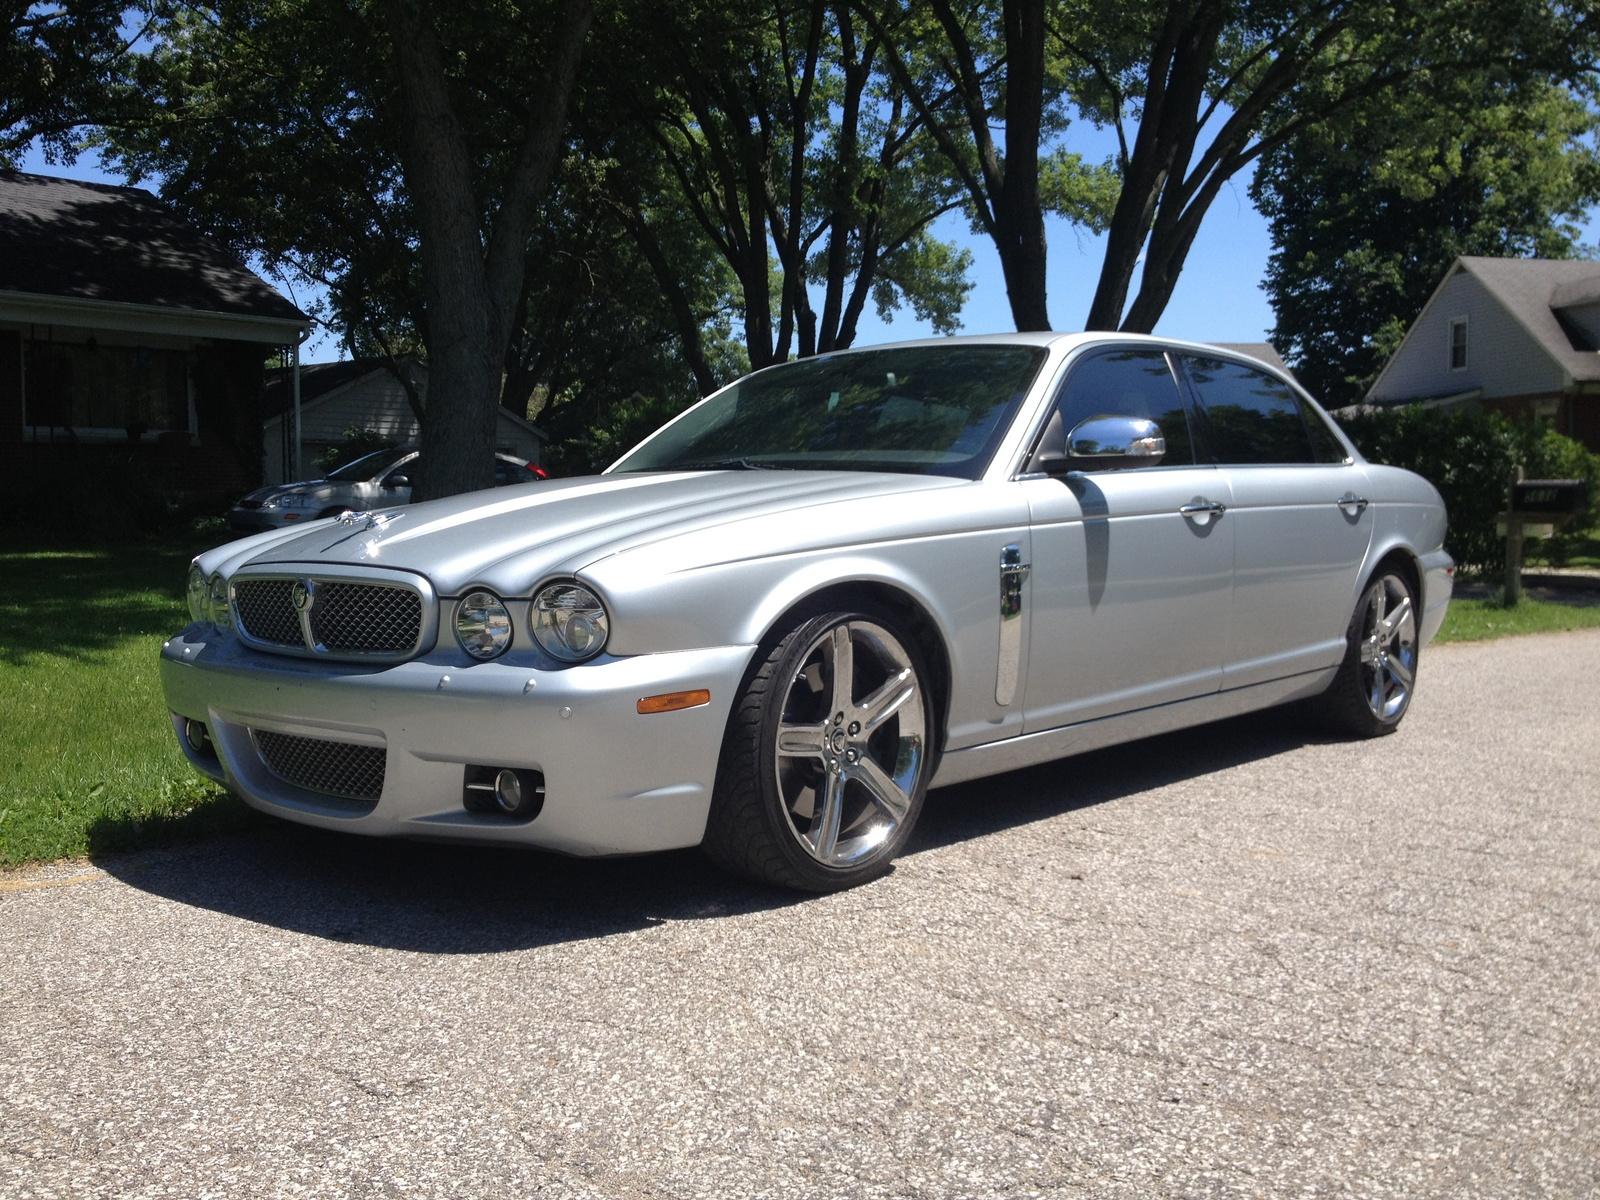 2014 jaguar xf price